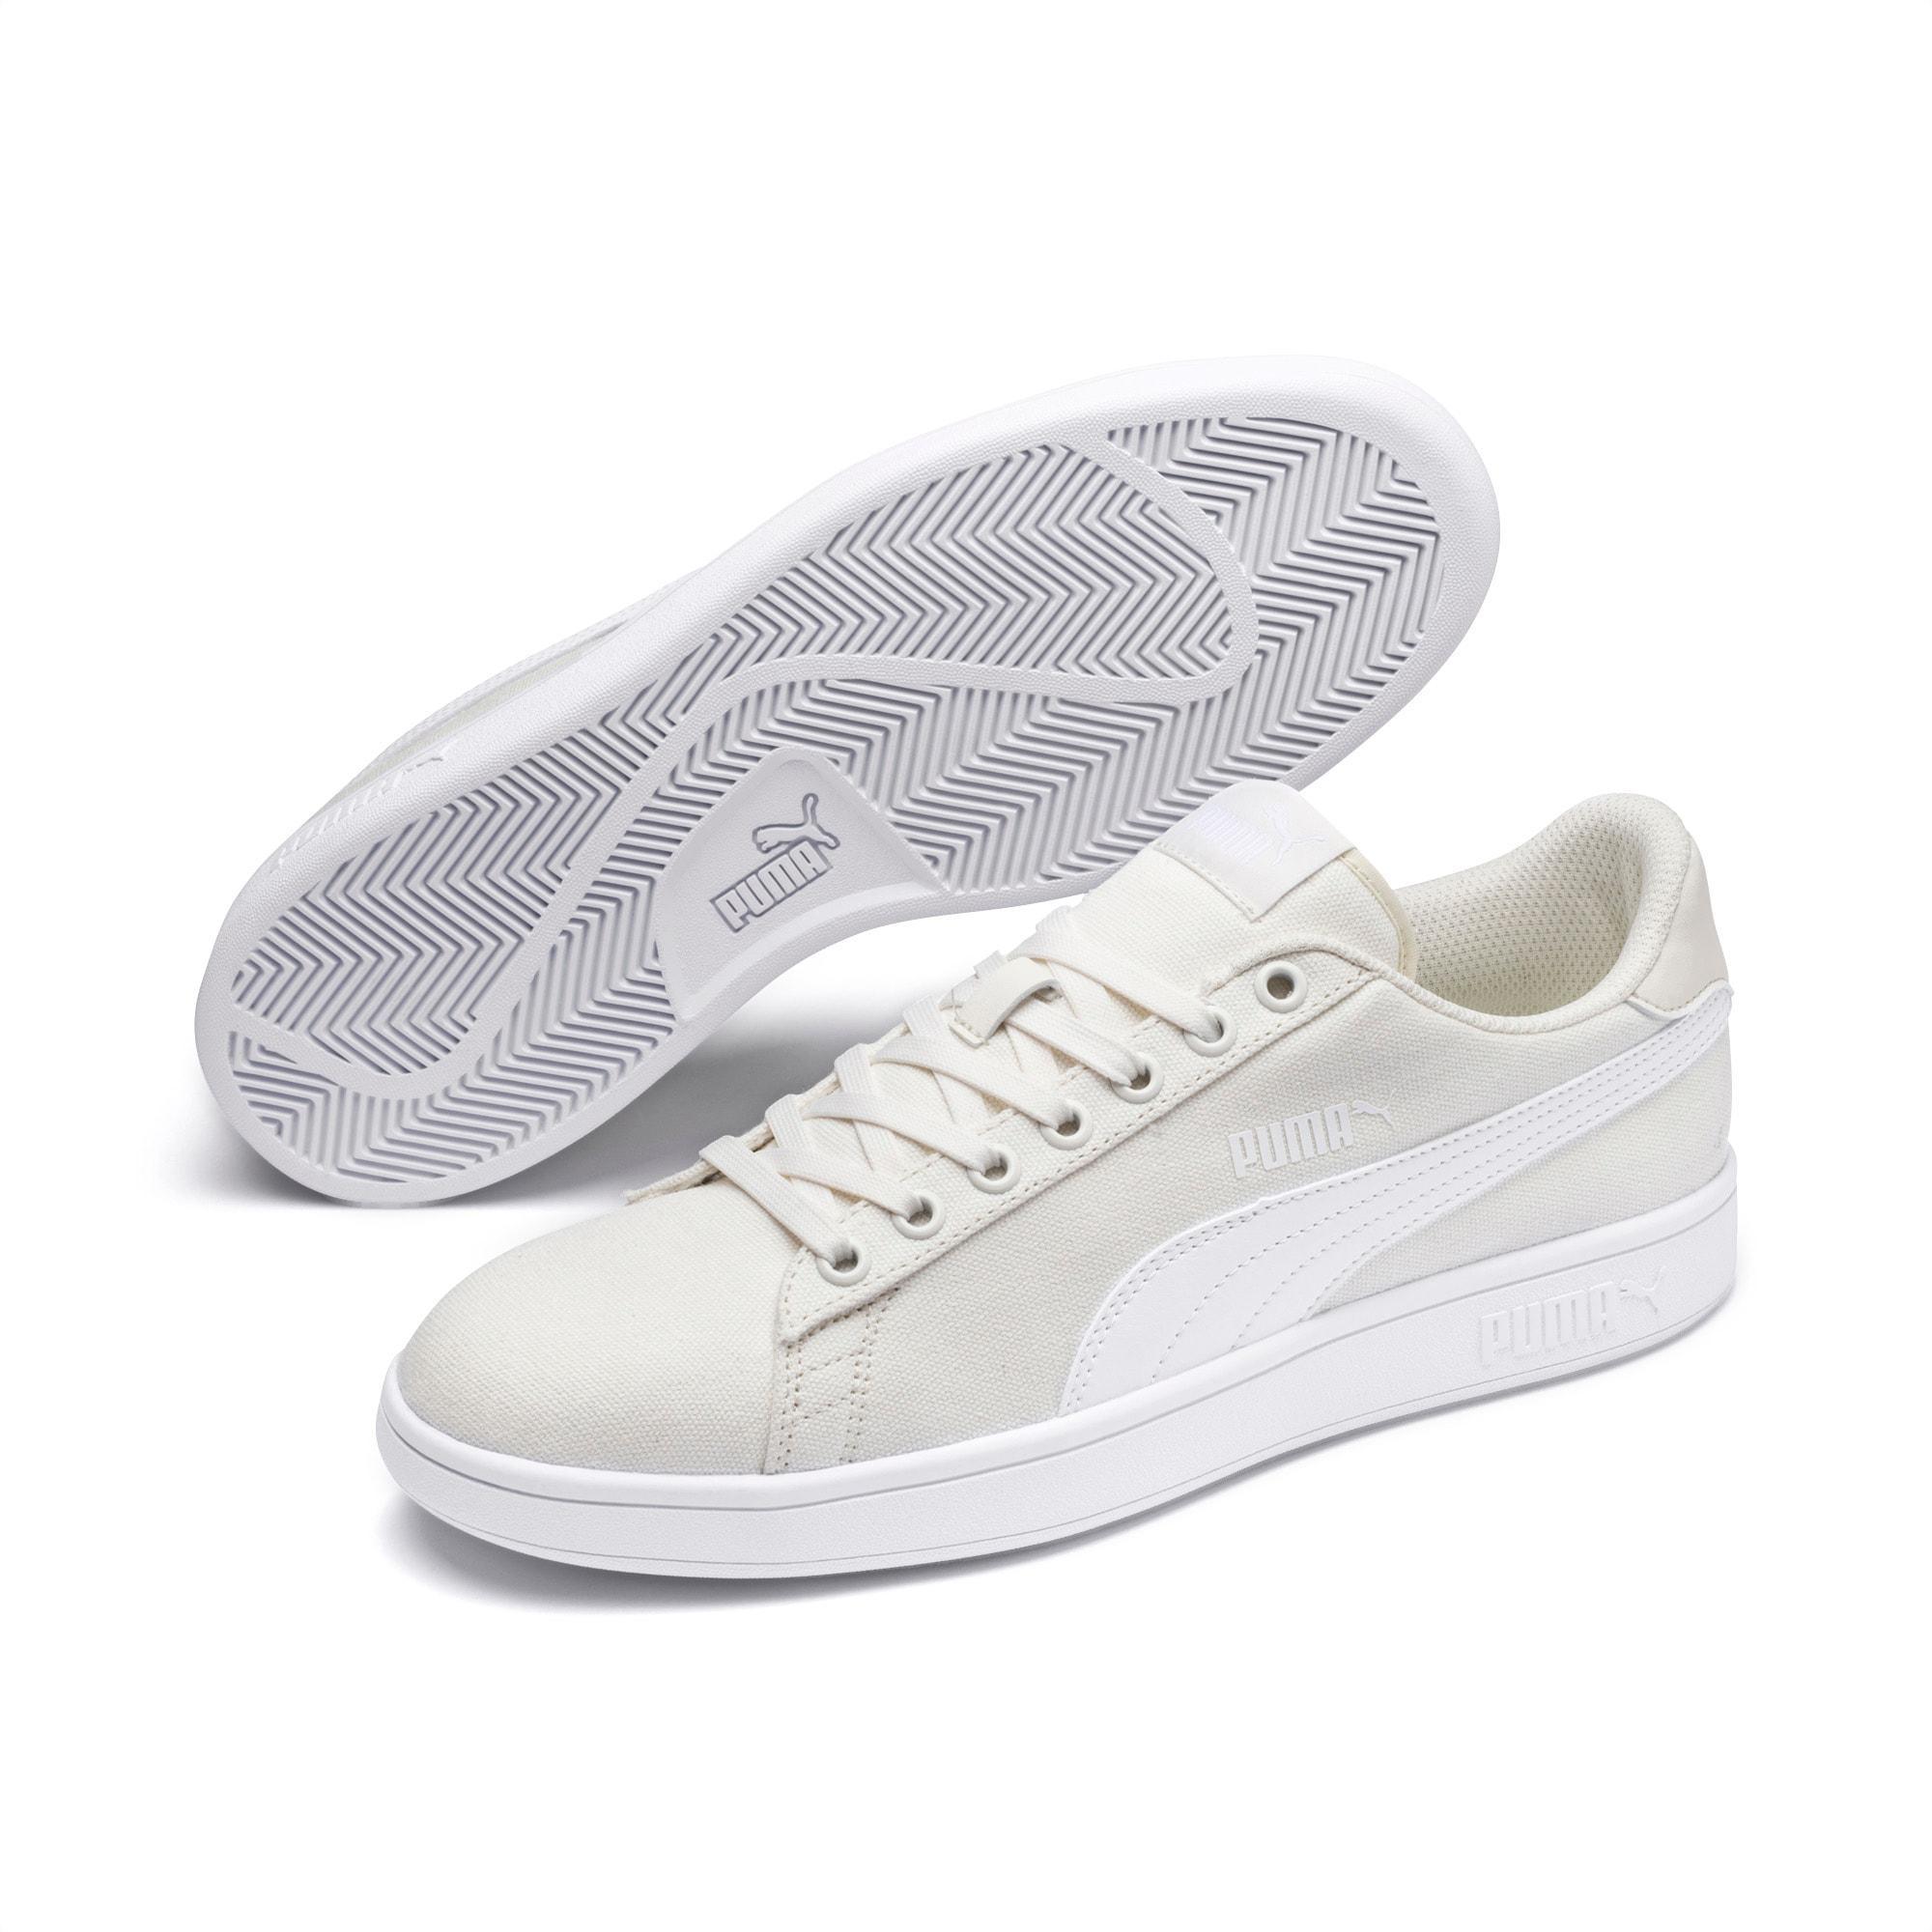 PUMA Smash V2 Canvas Men's Sneakers in